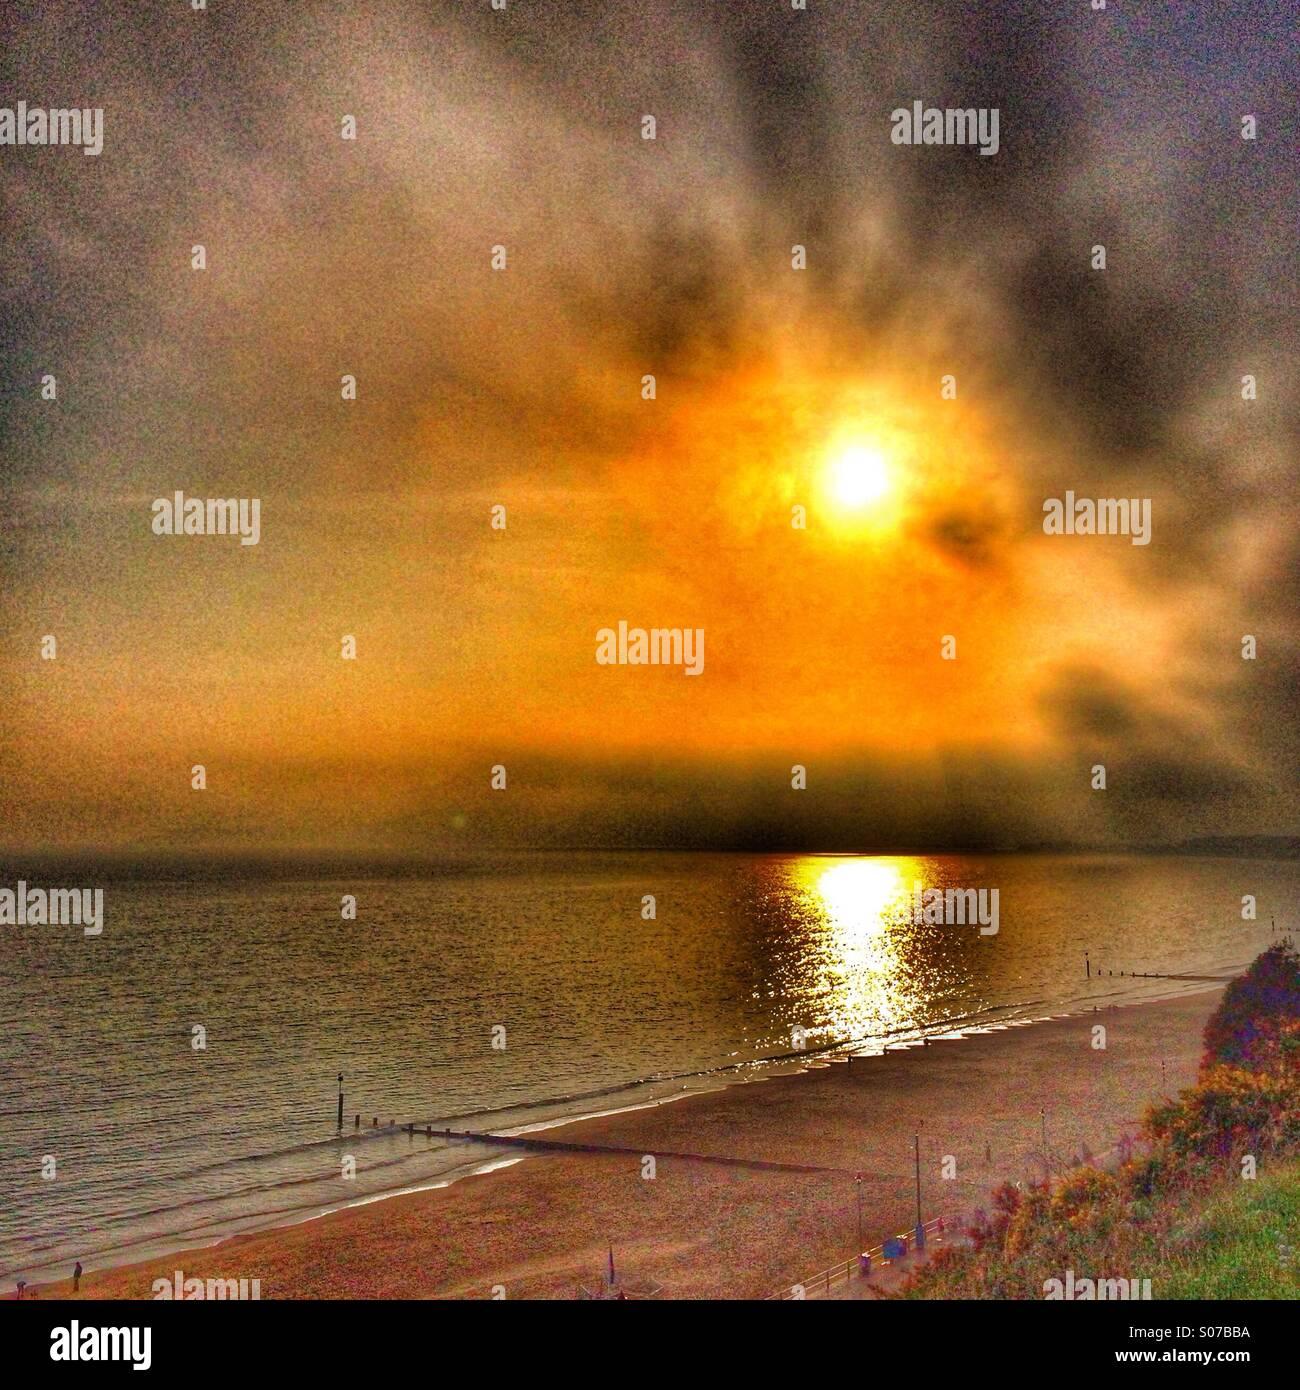 Seaside - Stock Image